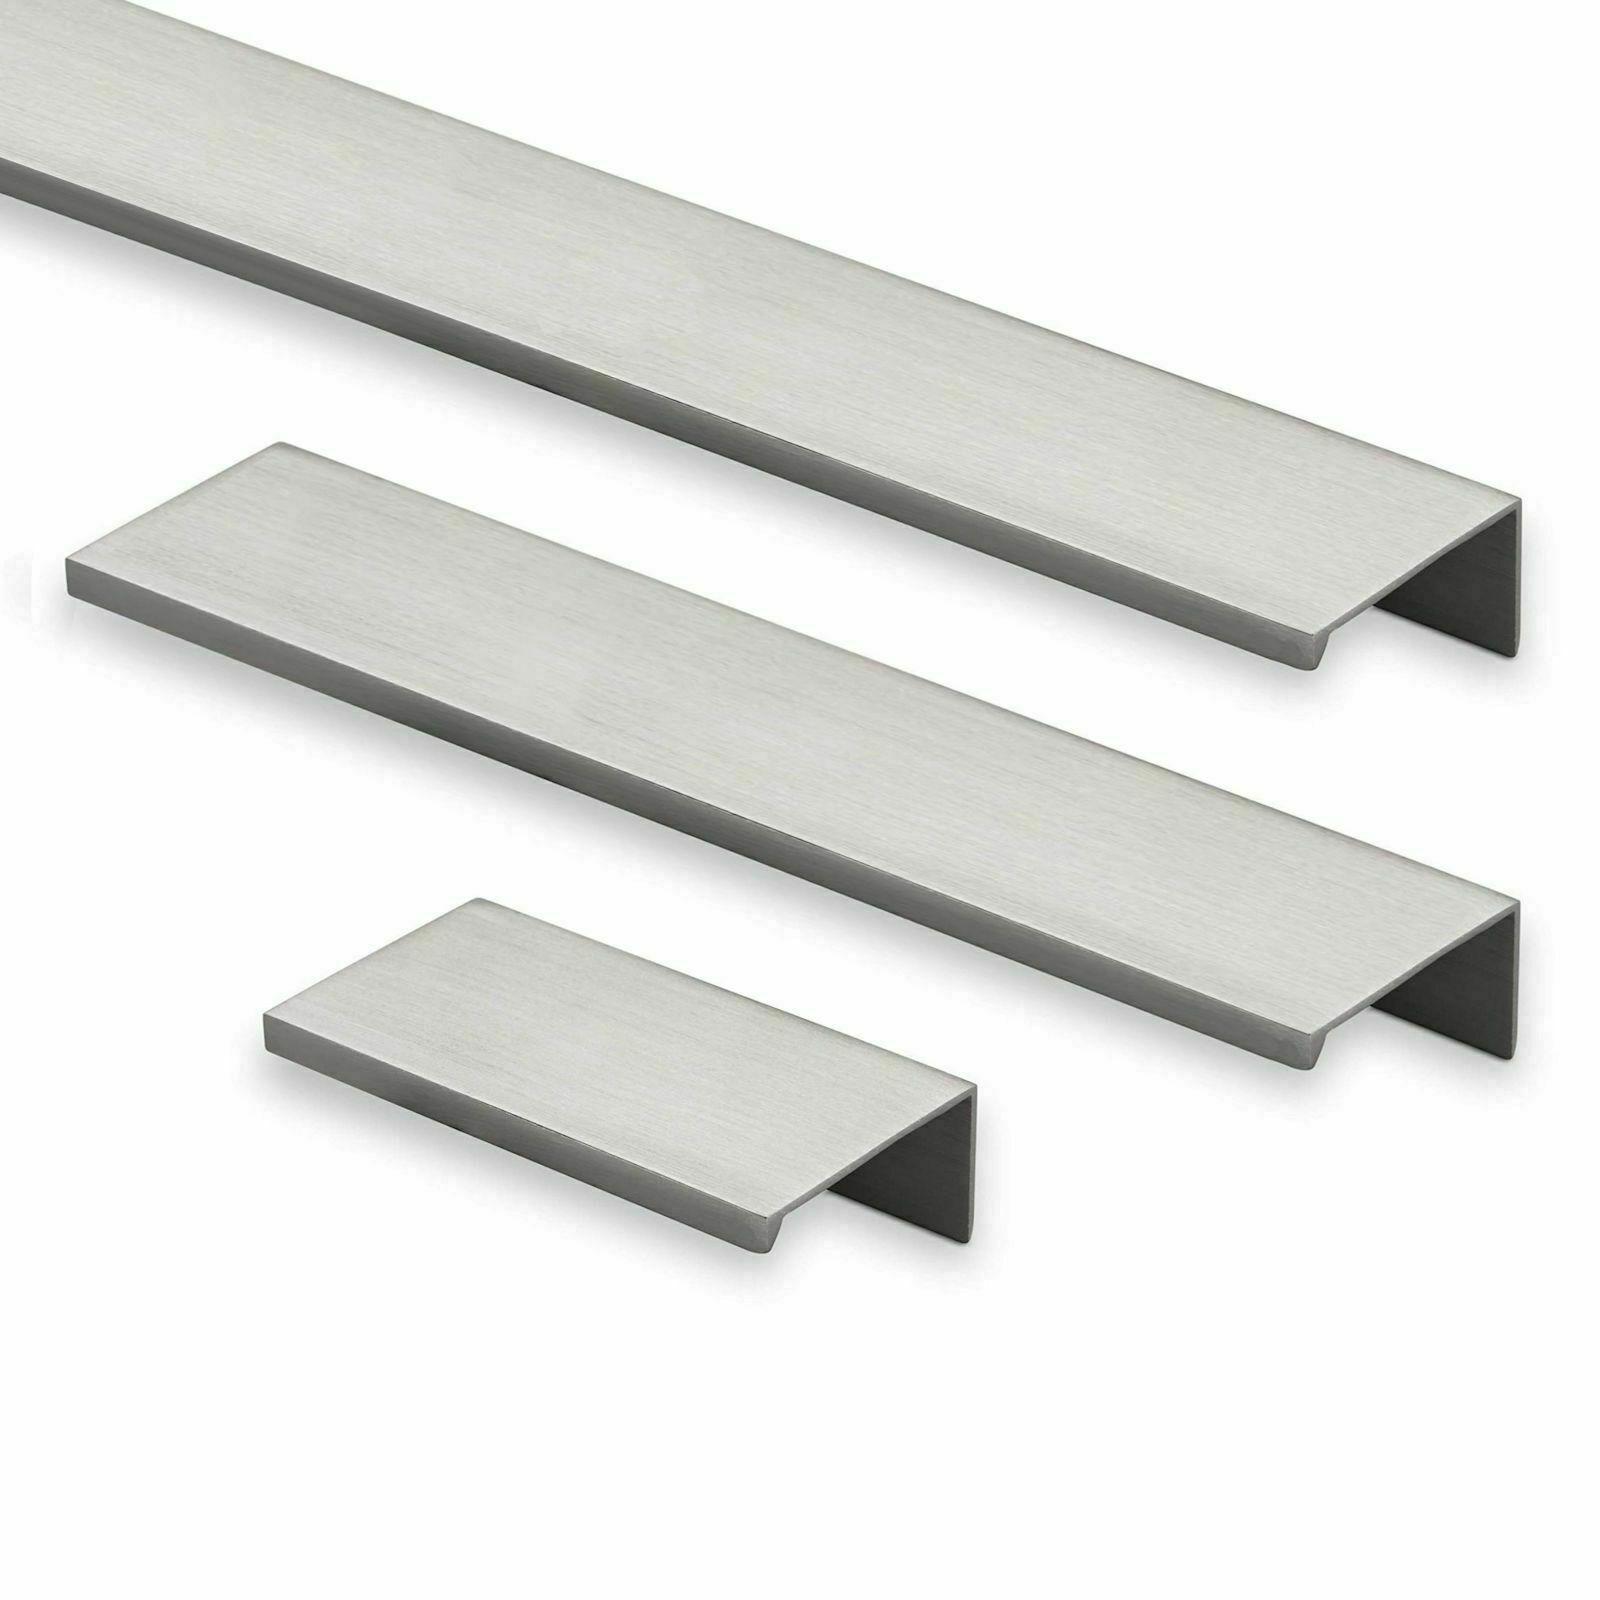 Häfele Möbelgriff Aluminium Griffleiste Kantengriff Griffmulde Schubladengriff